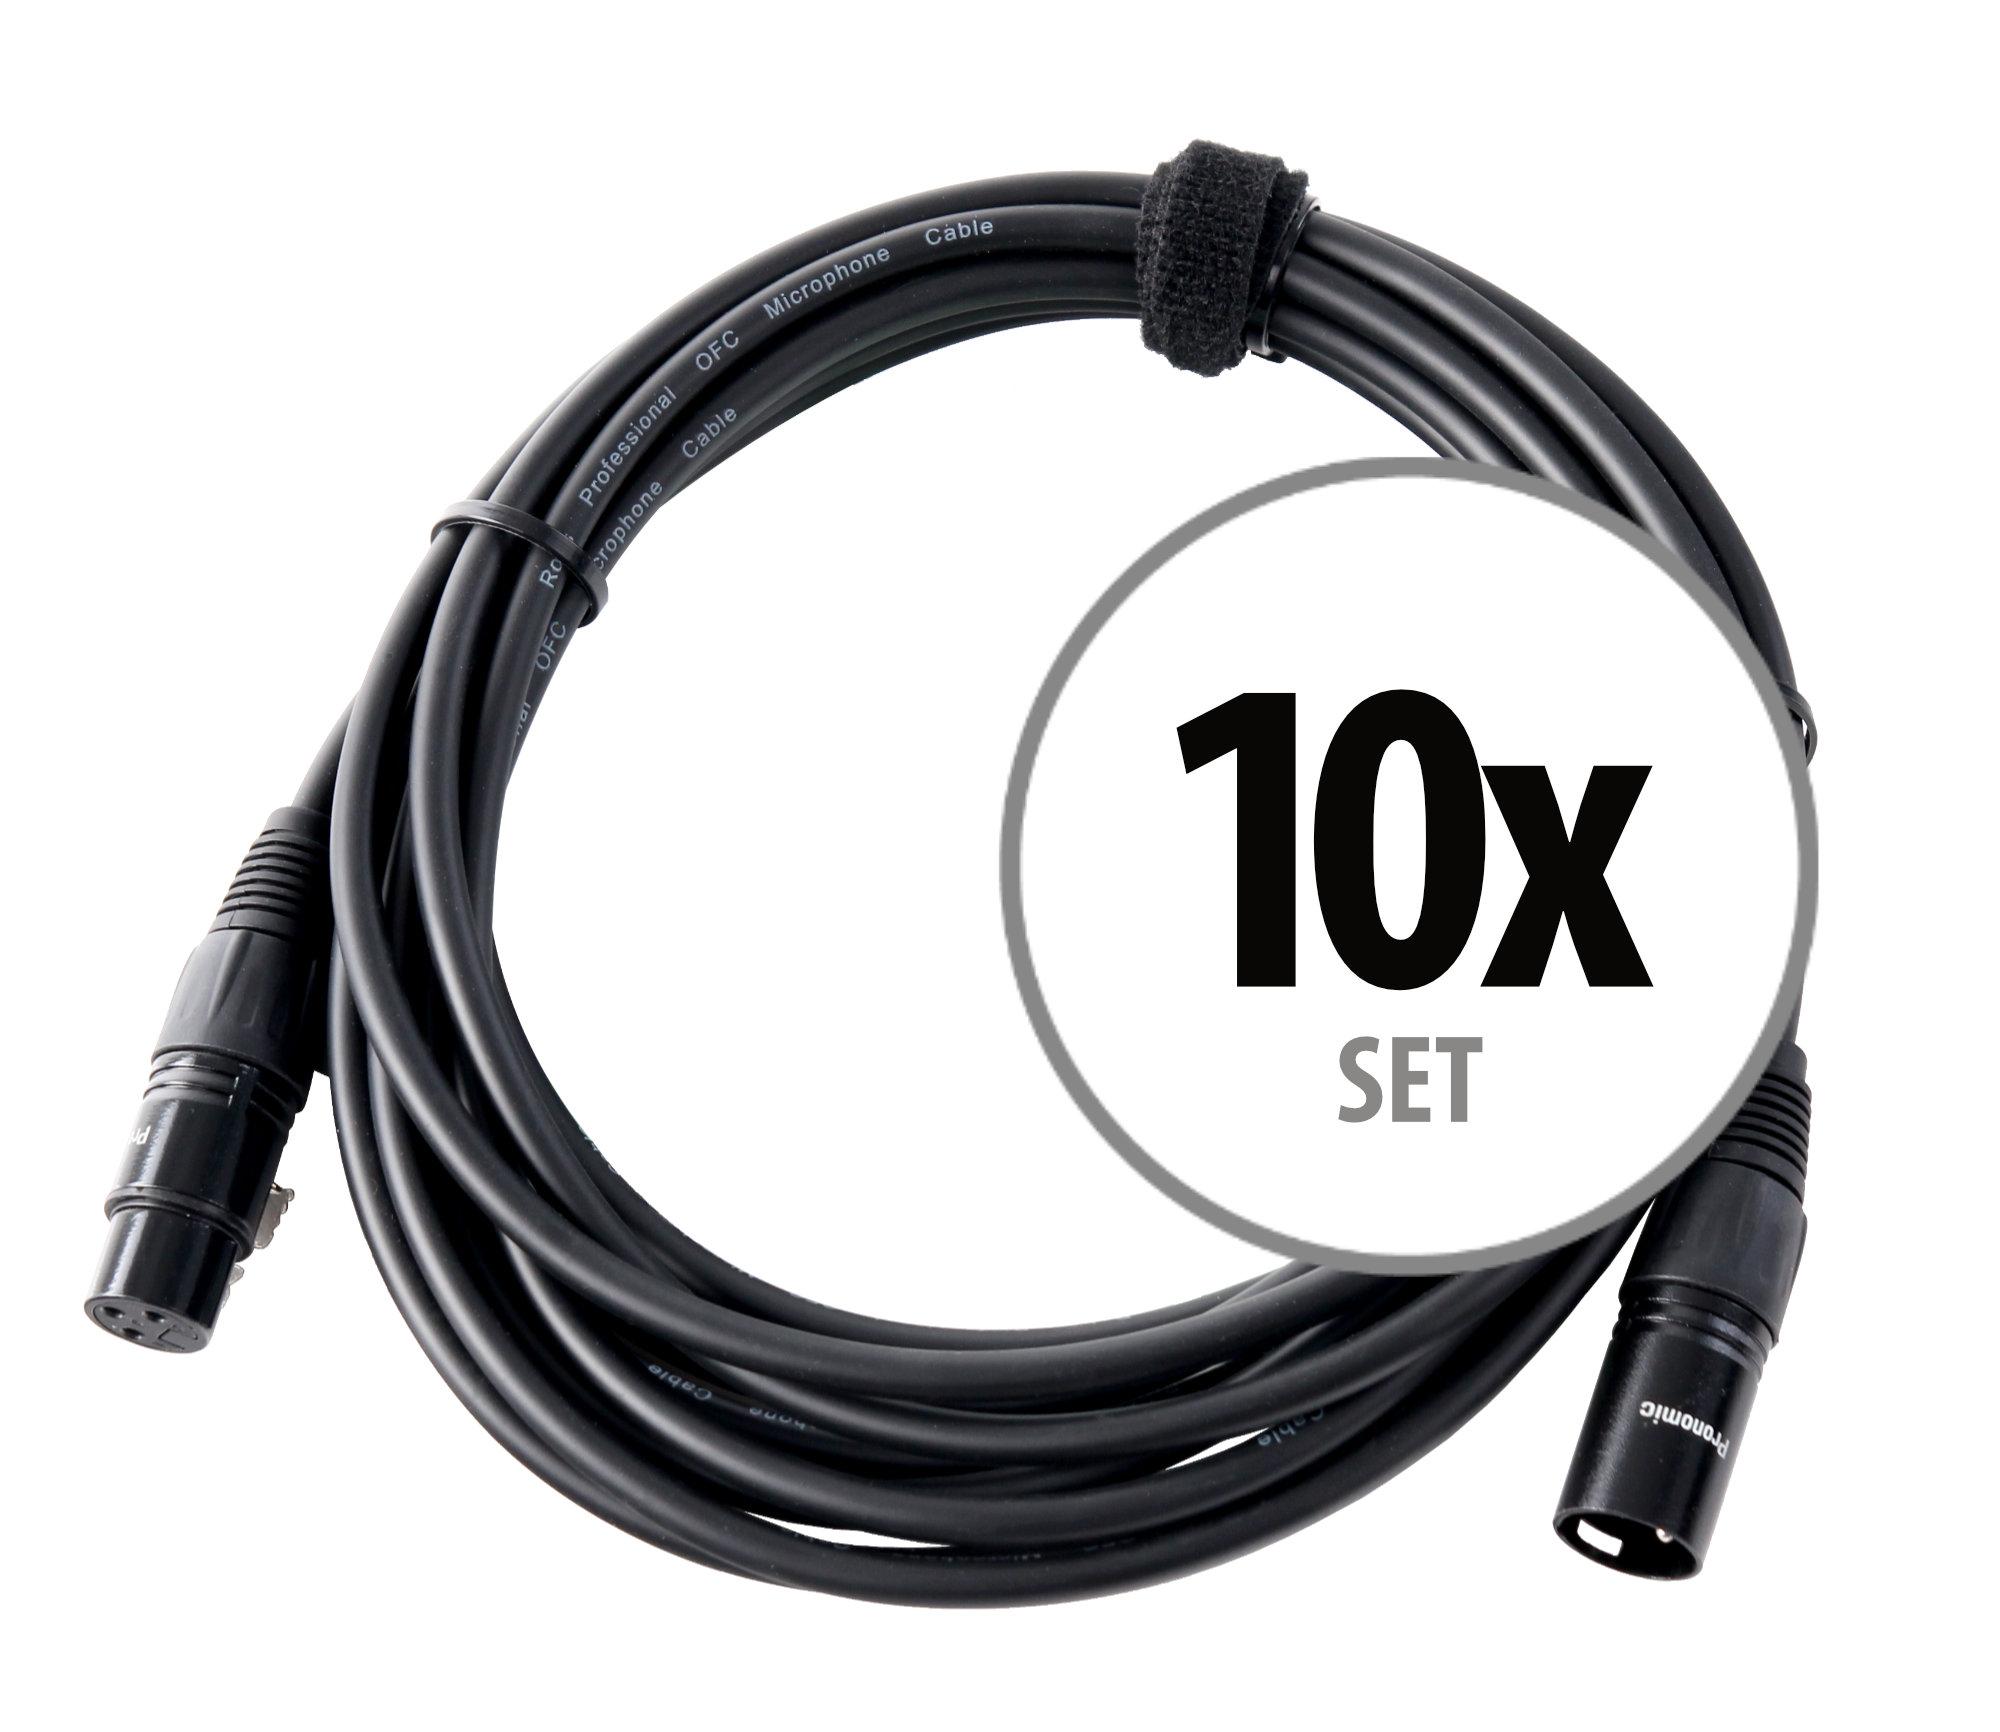 10er Set Pronomic Stage XFXM 5 Mikrofonkabel XLR 5 m Schwarz